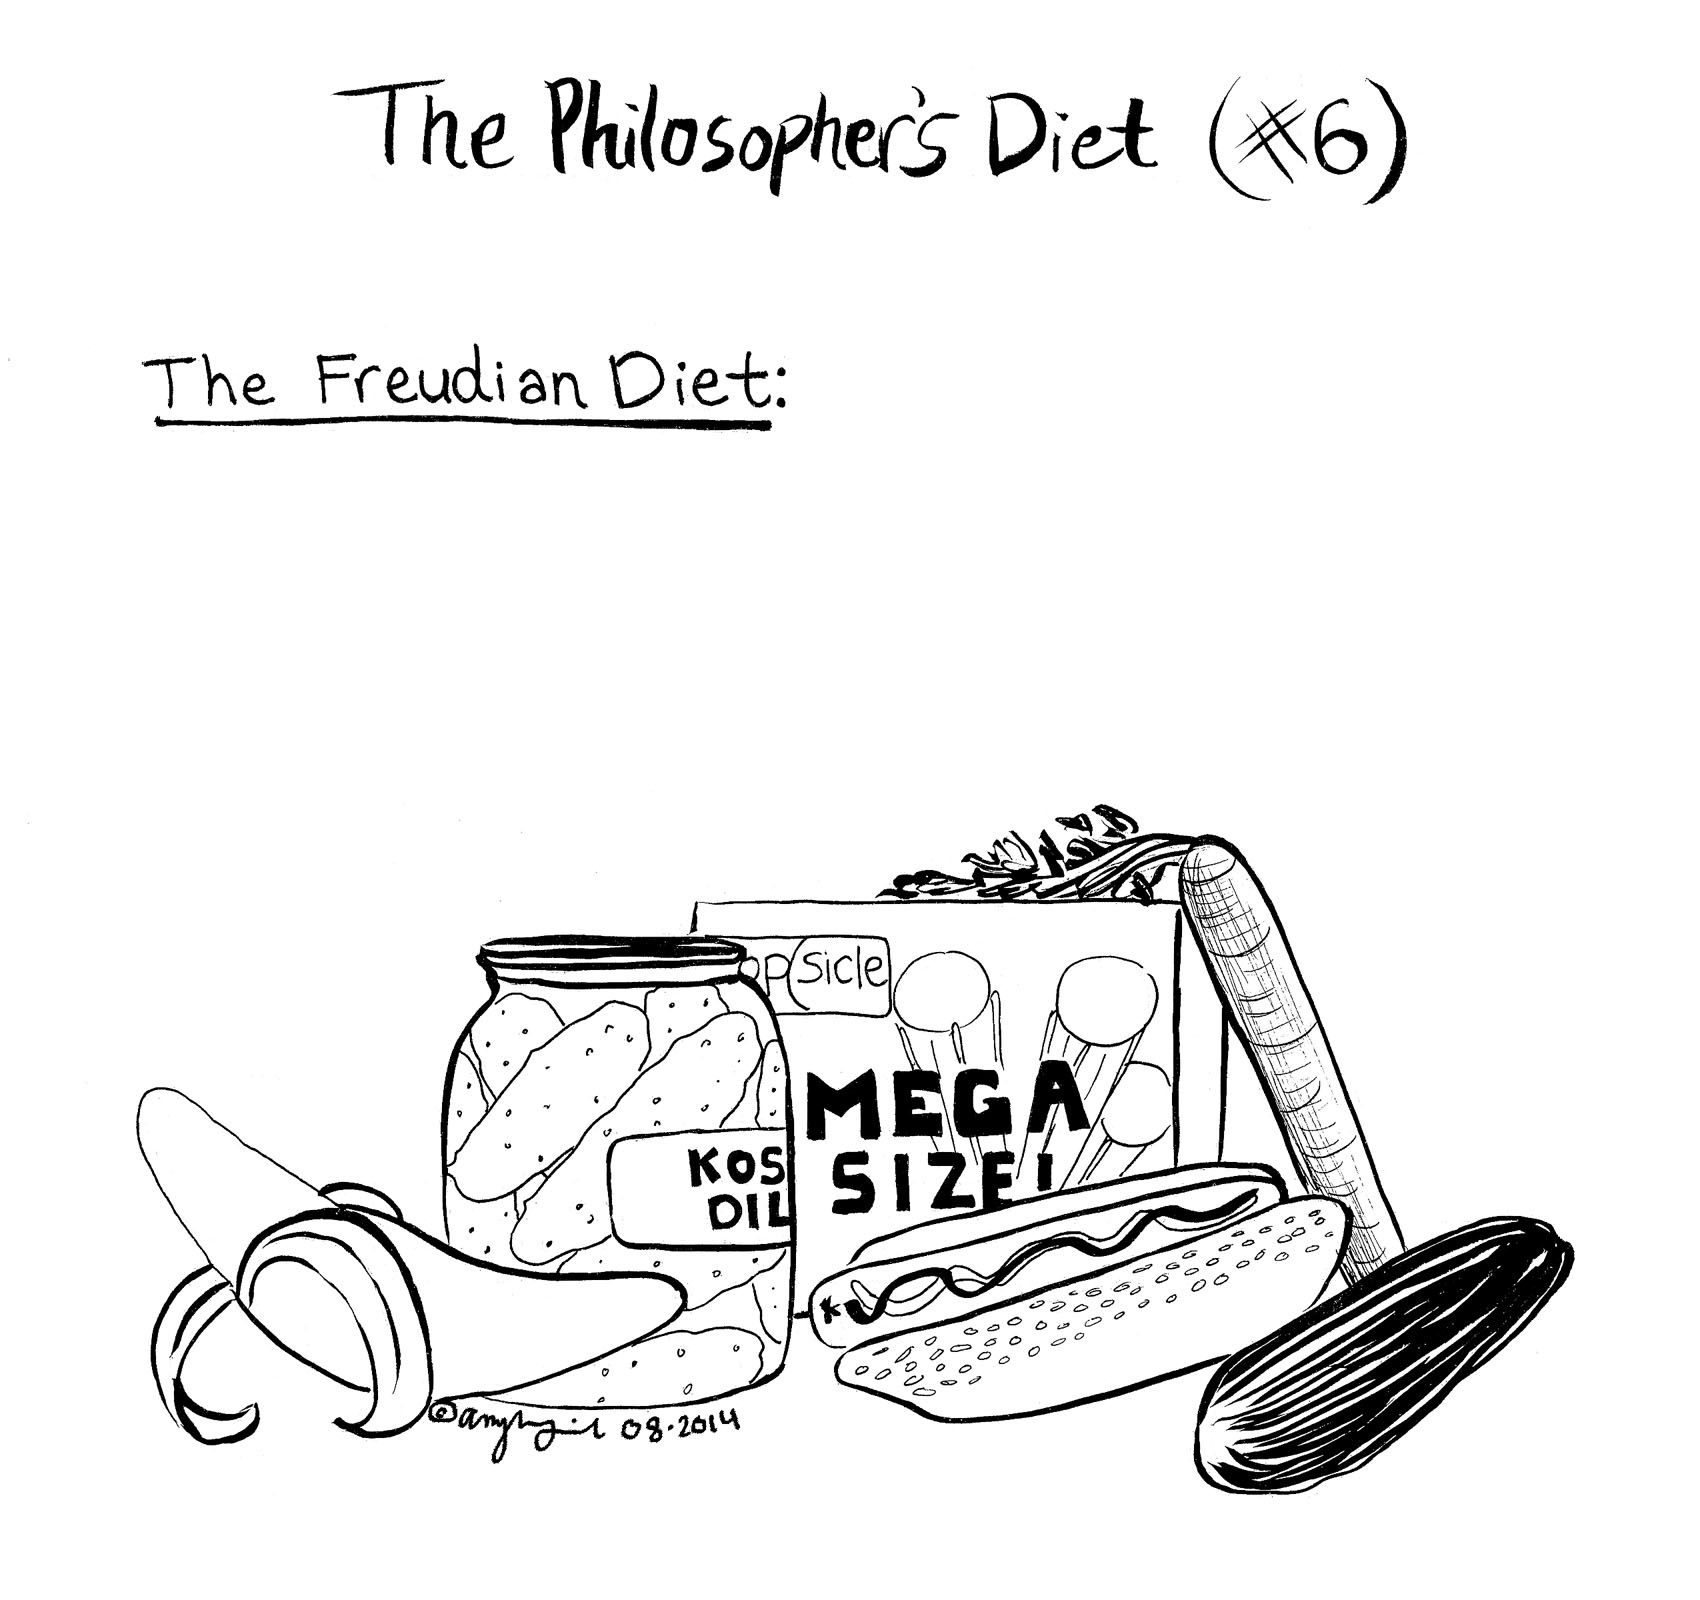 Freudian diet